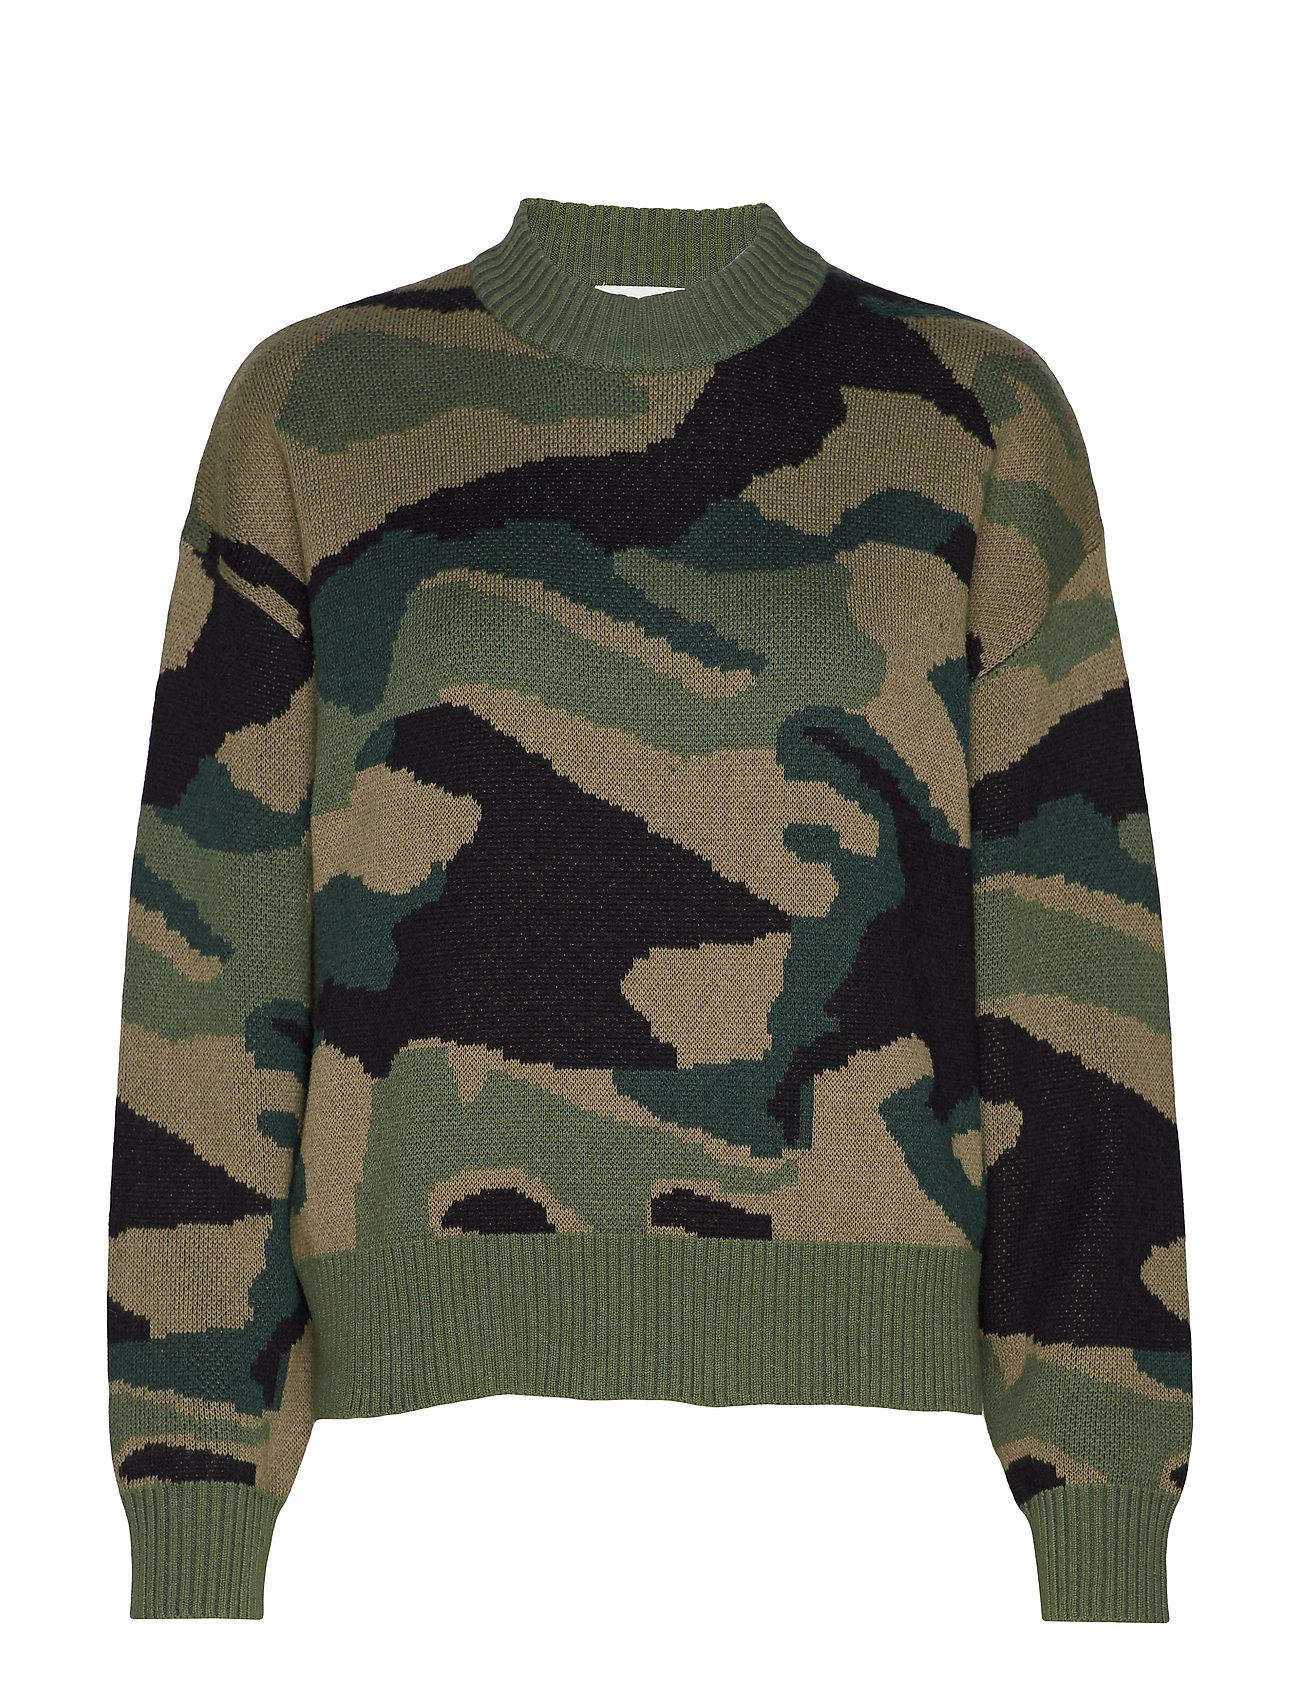 IBEN Camo Sweater ST - ARMY